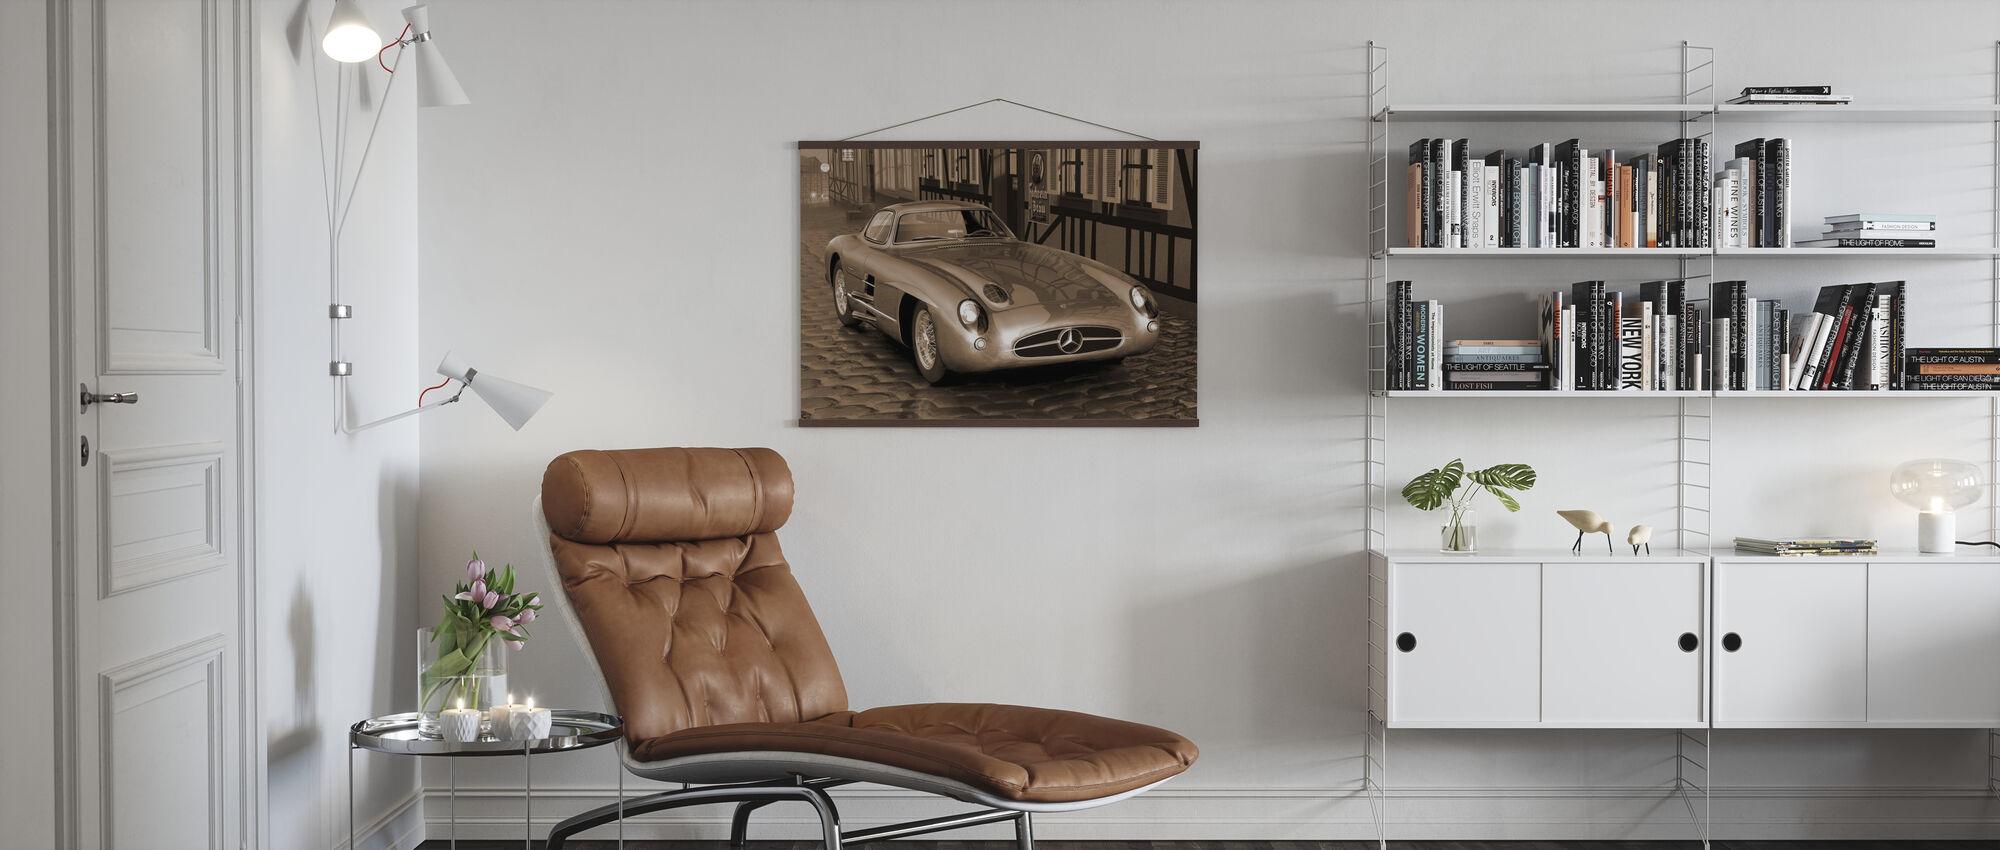 Shiny 300 Sepia - Poster - Living Room